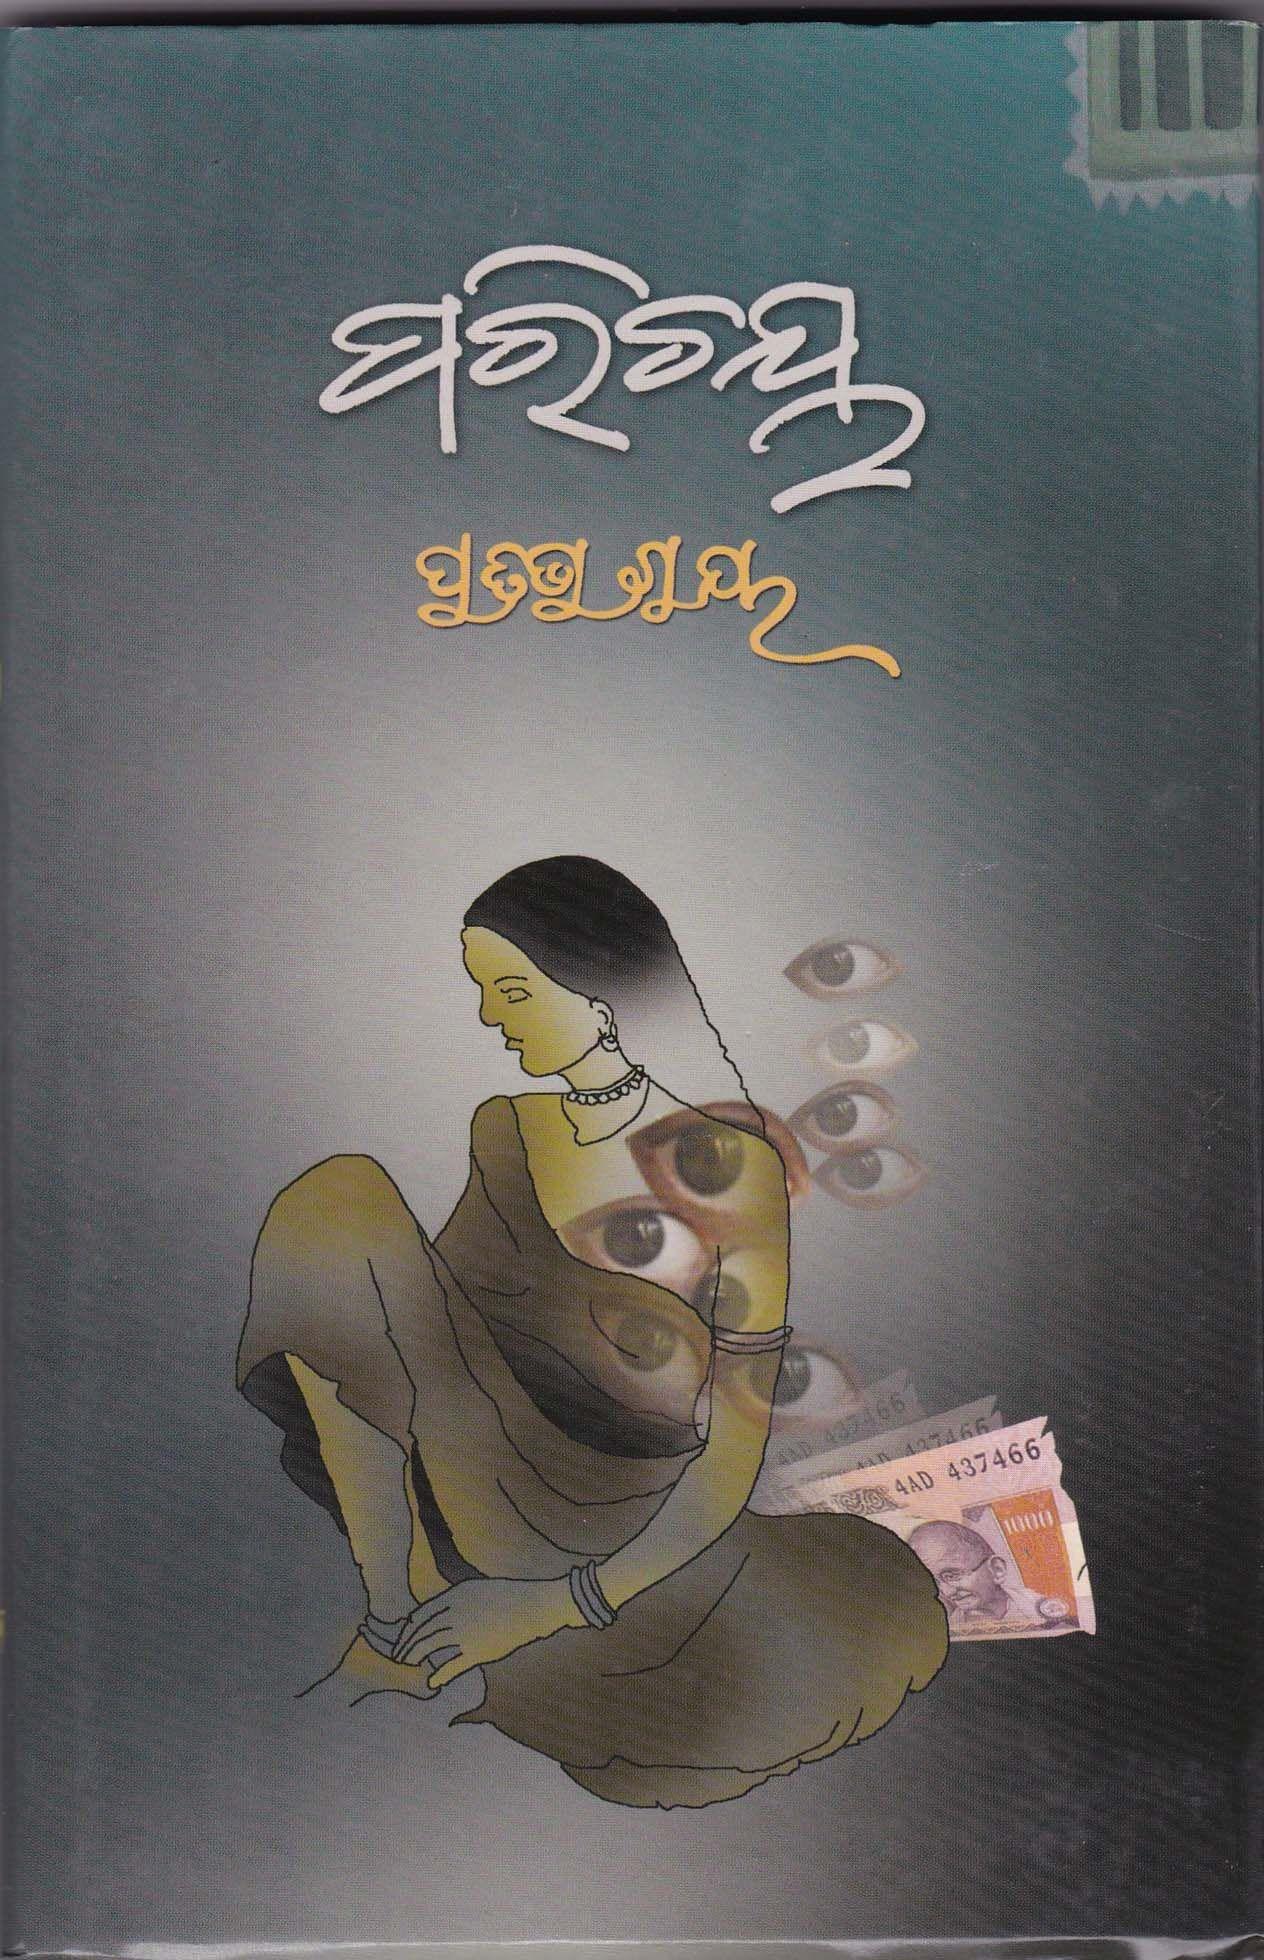 Parichaya oriya novel best seller books pinterest novels and parichaya oriya novel best seller books pinterest novels and books fandeluxe Gallery